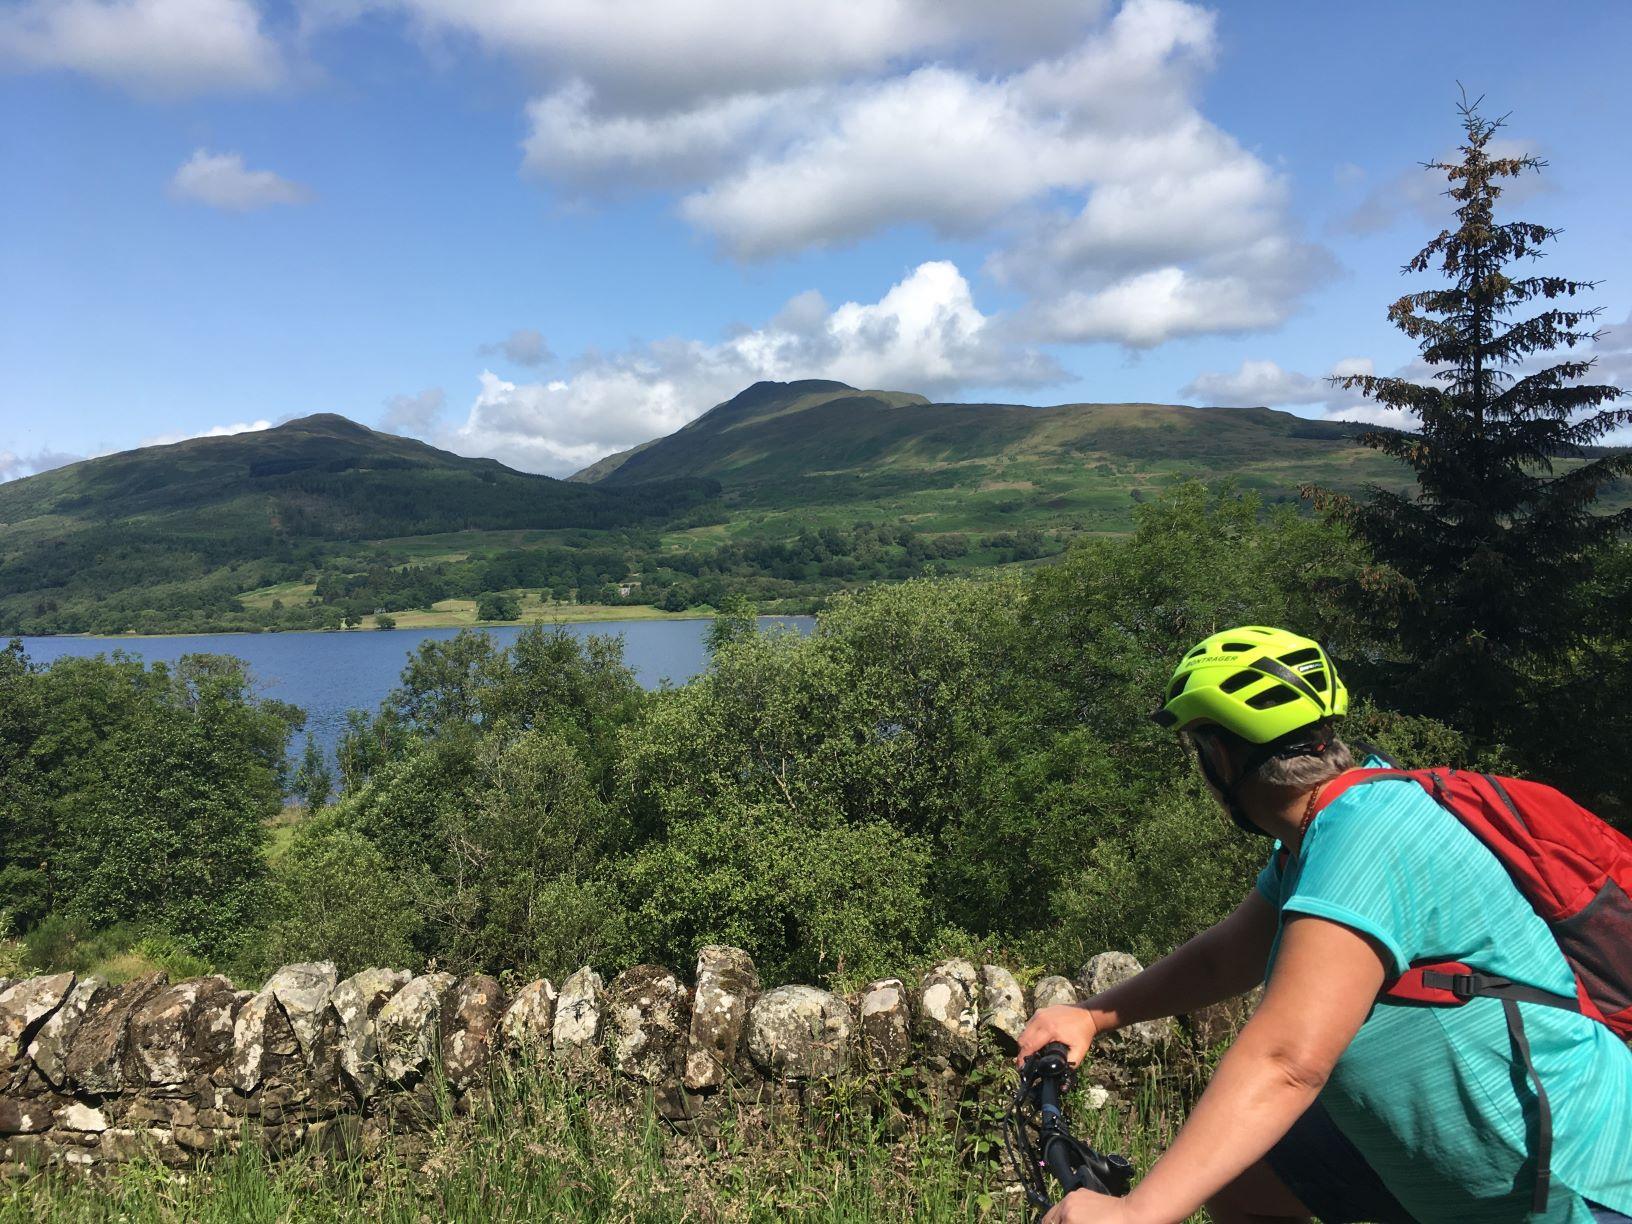 e biking tours of trossachs